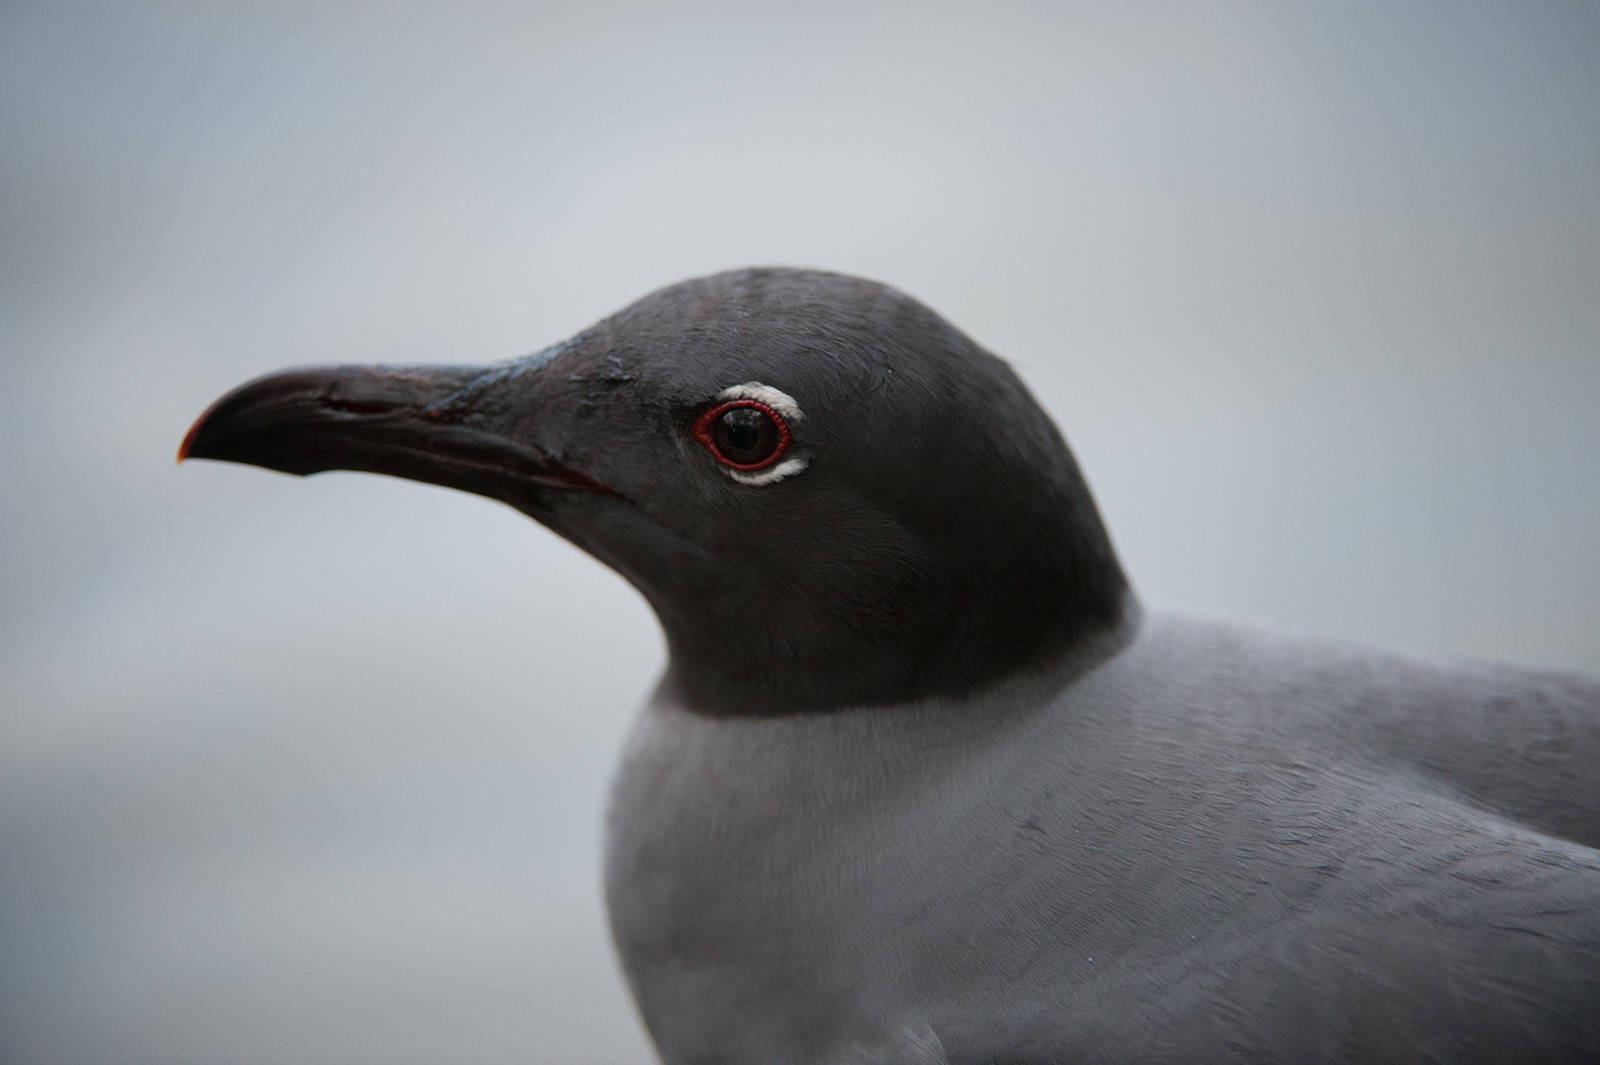 Photo: One of the rarest birds in the world, the lava gull (Leucophaeus fuliginosus) on Santa Cruz Island, on the edge of Galapagos National Park.